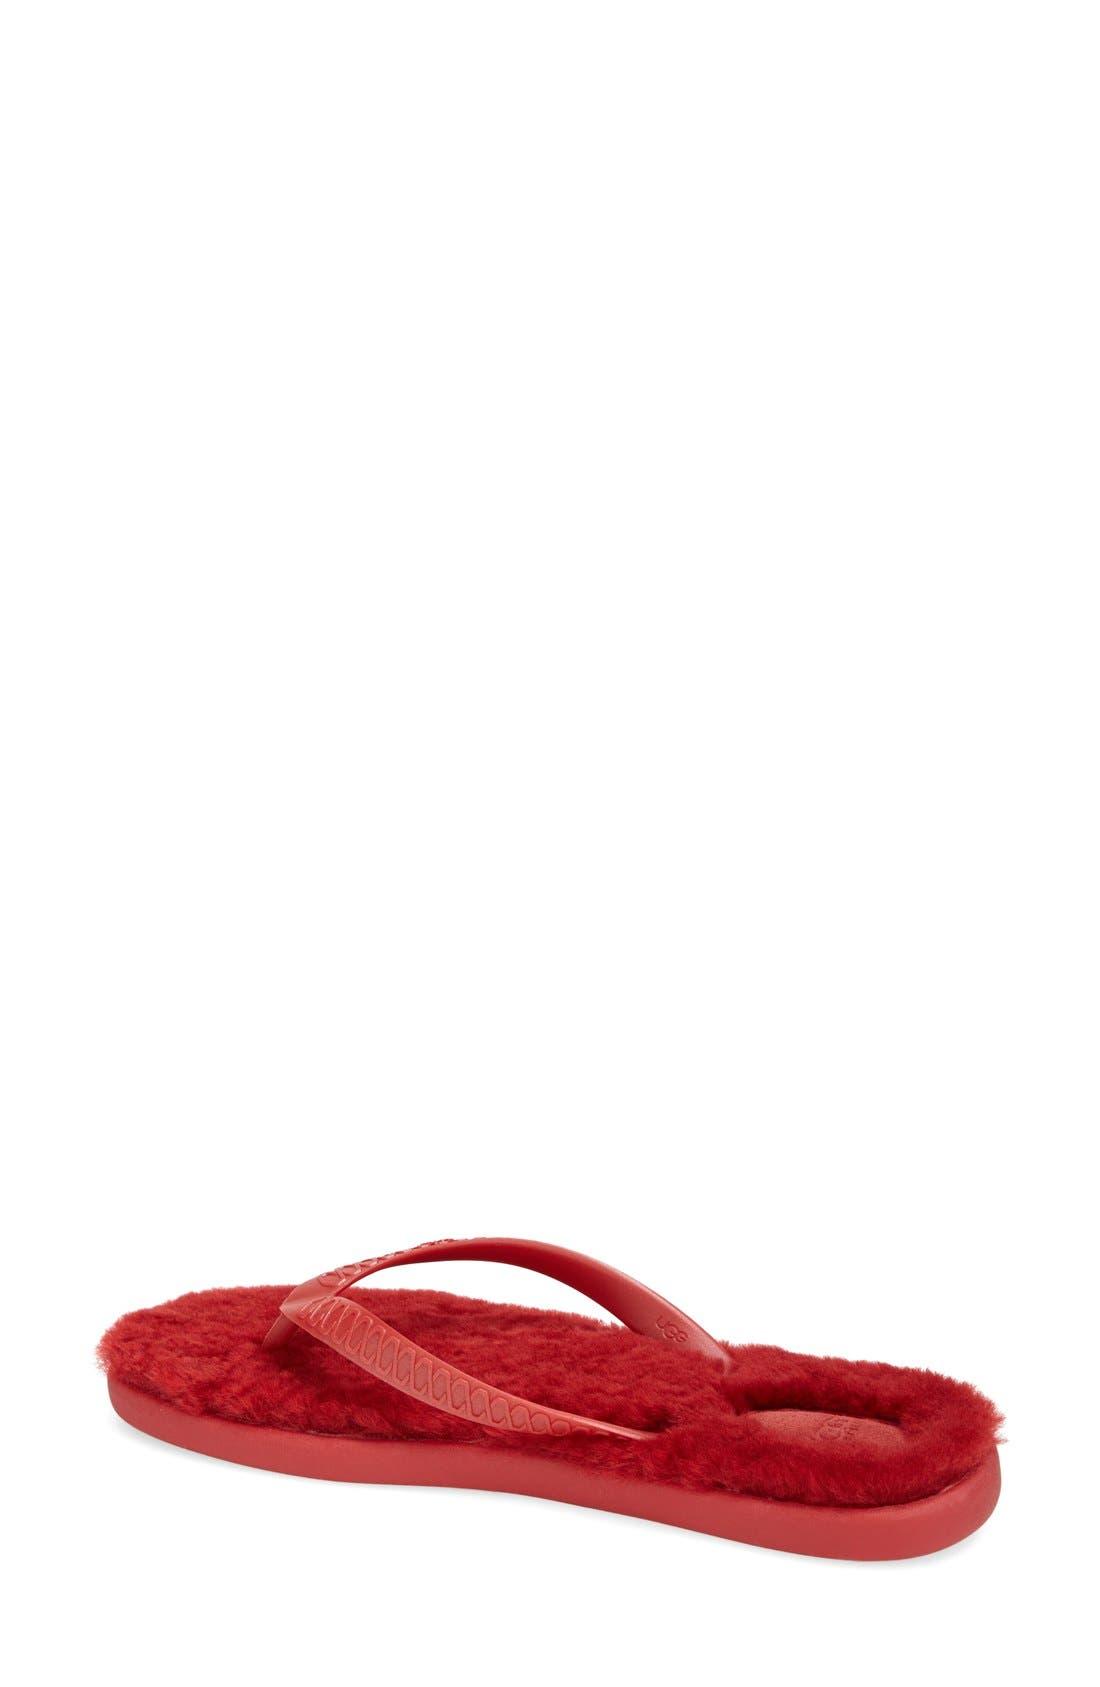 Alternate Image 2  - UGG® 'Fluffie' Flip Flop (Women)